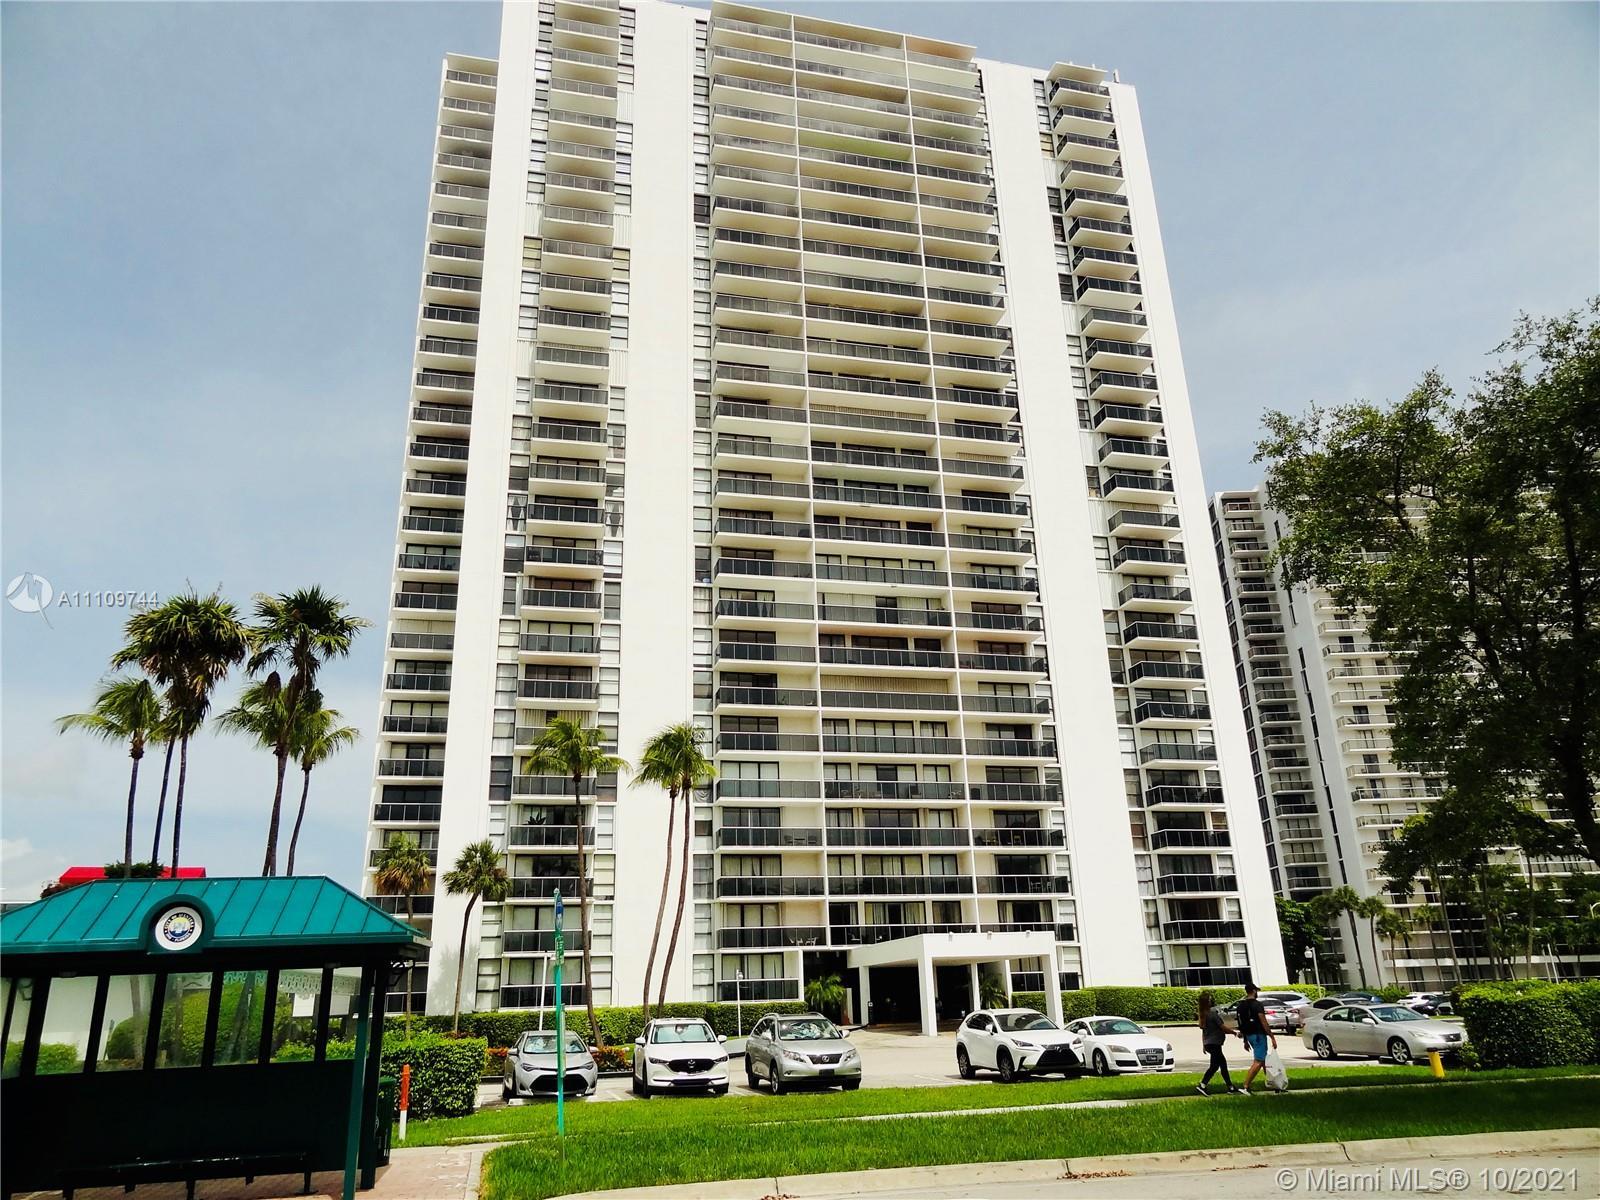 Eldorado Tower Two #708 - 3675 N Country Club Dr #708, Aventura, FL 33180